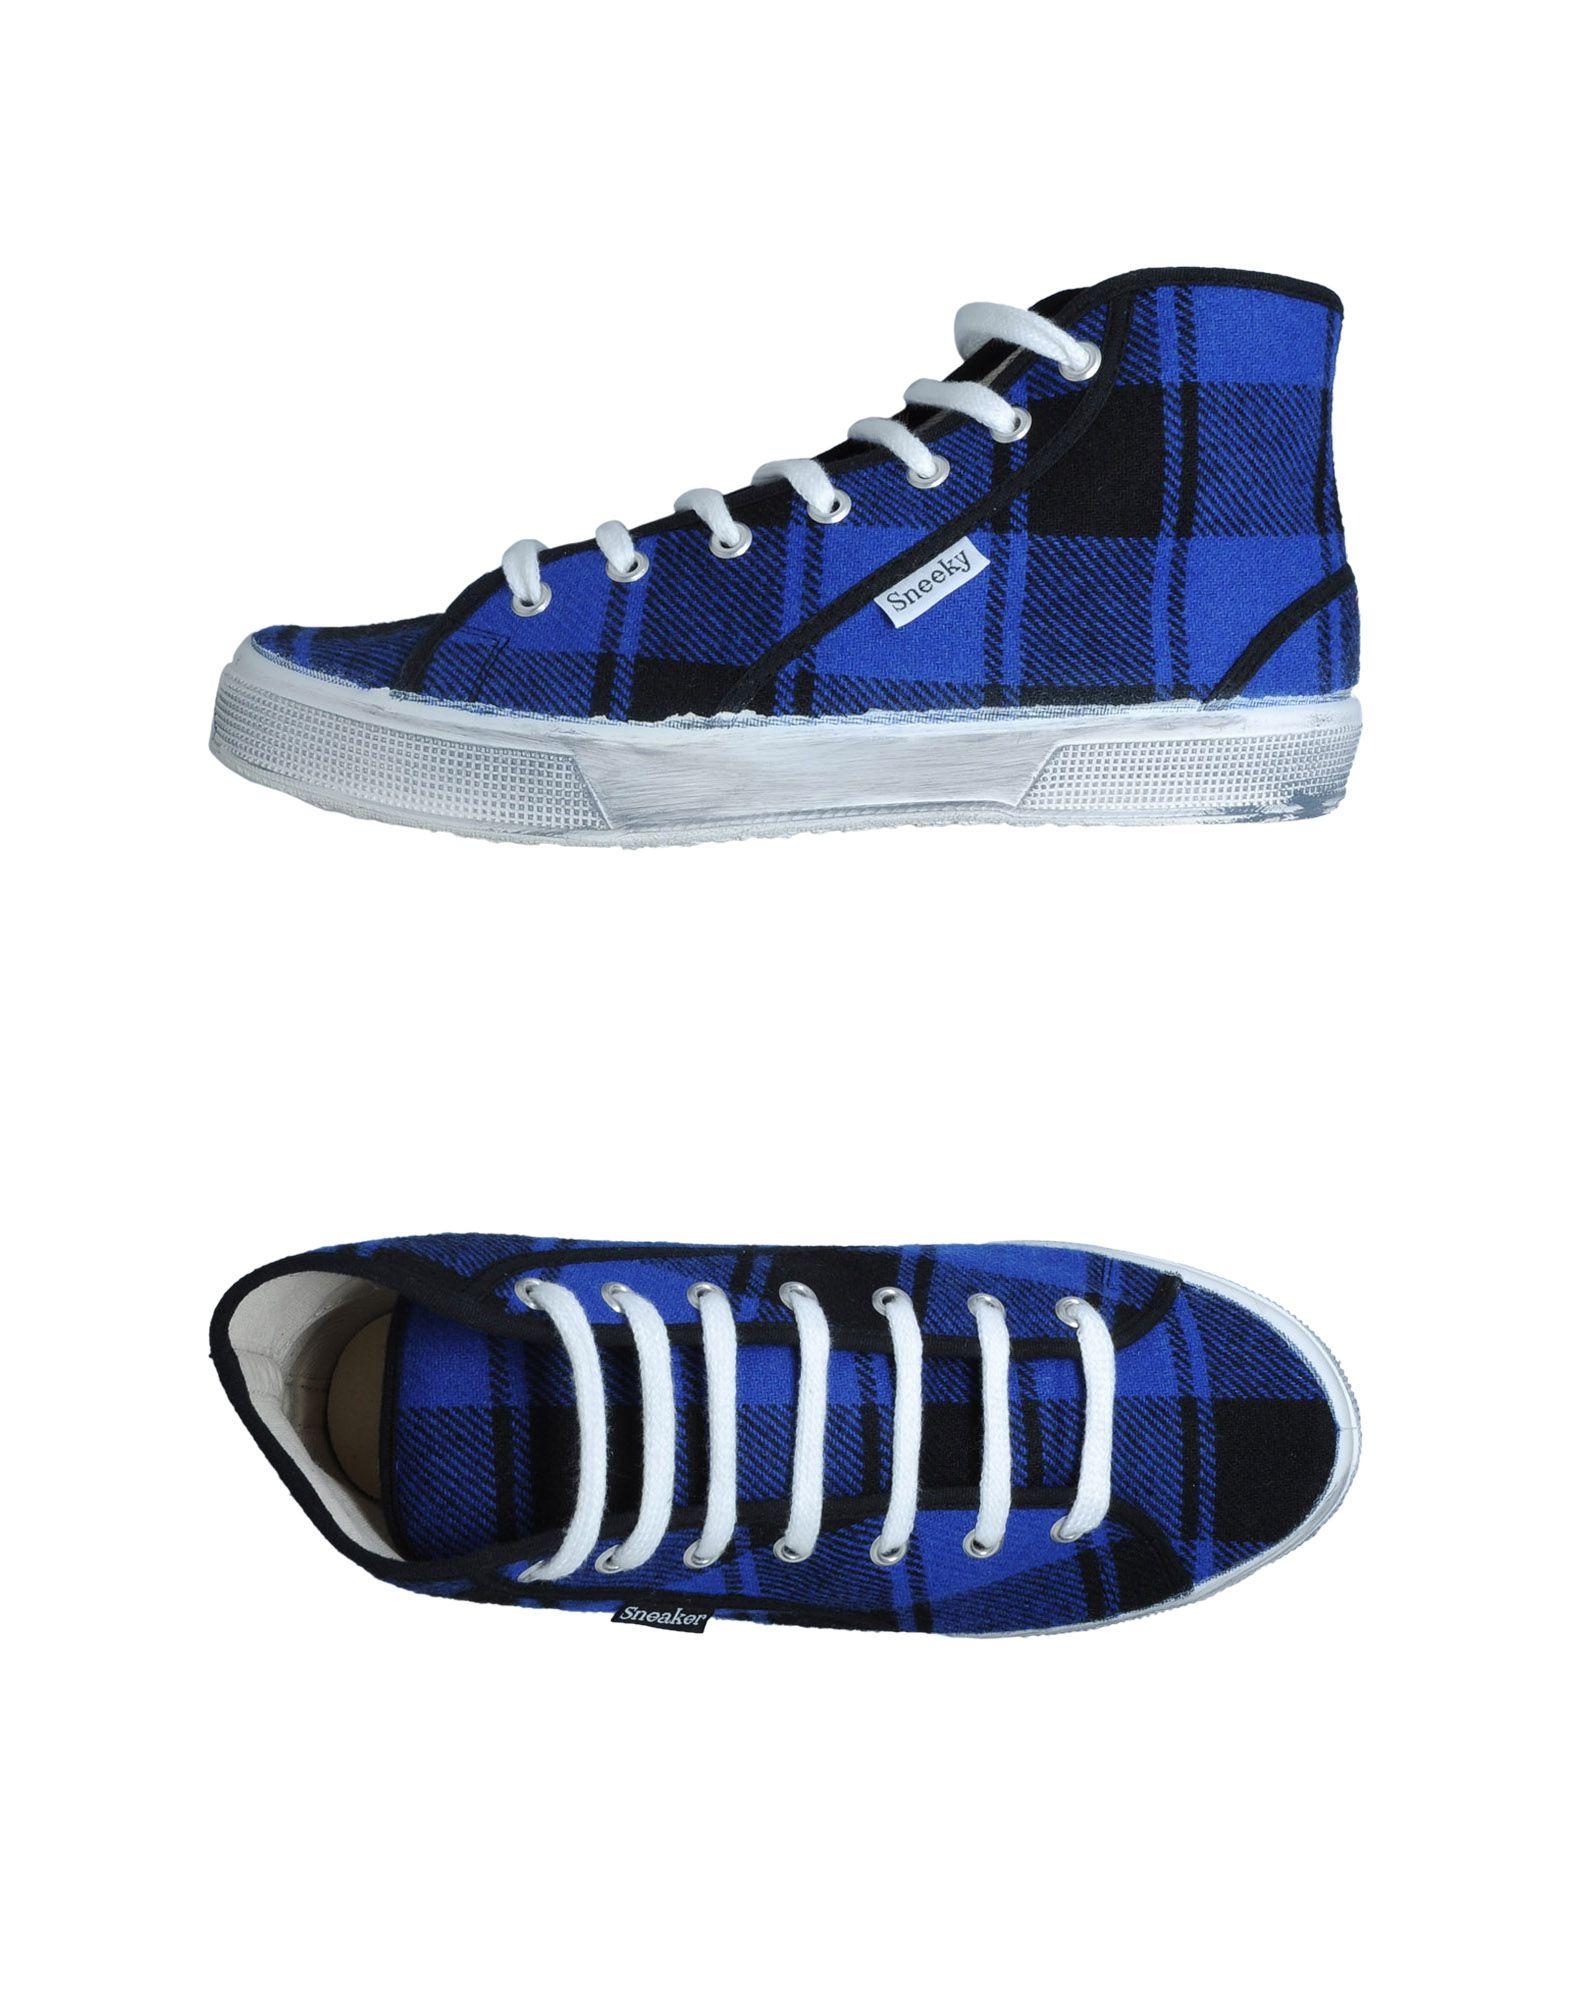 SNEEKY SNEAKER Высокие кеды кроссовки высокие ecco intrinsic sneaker